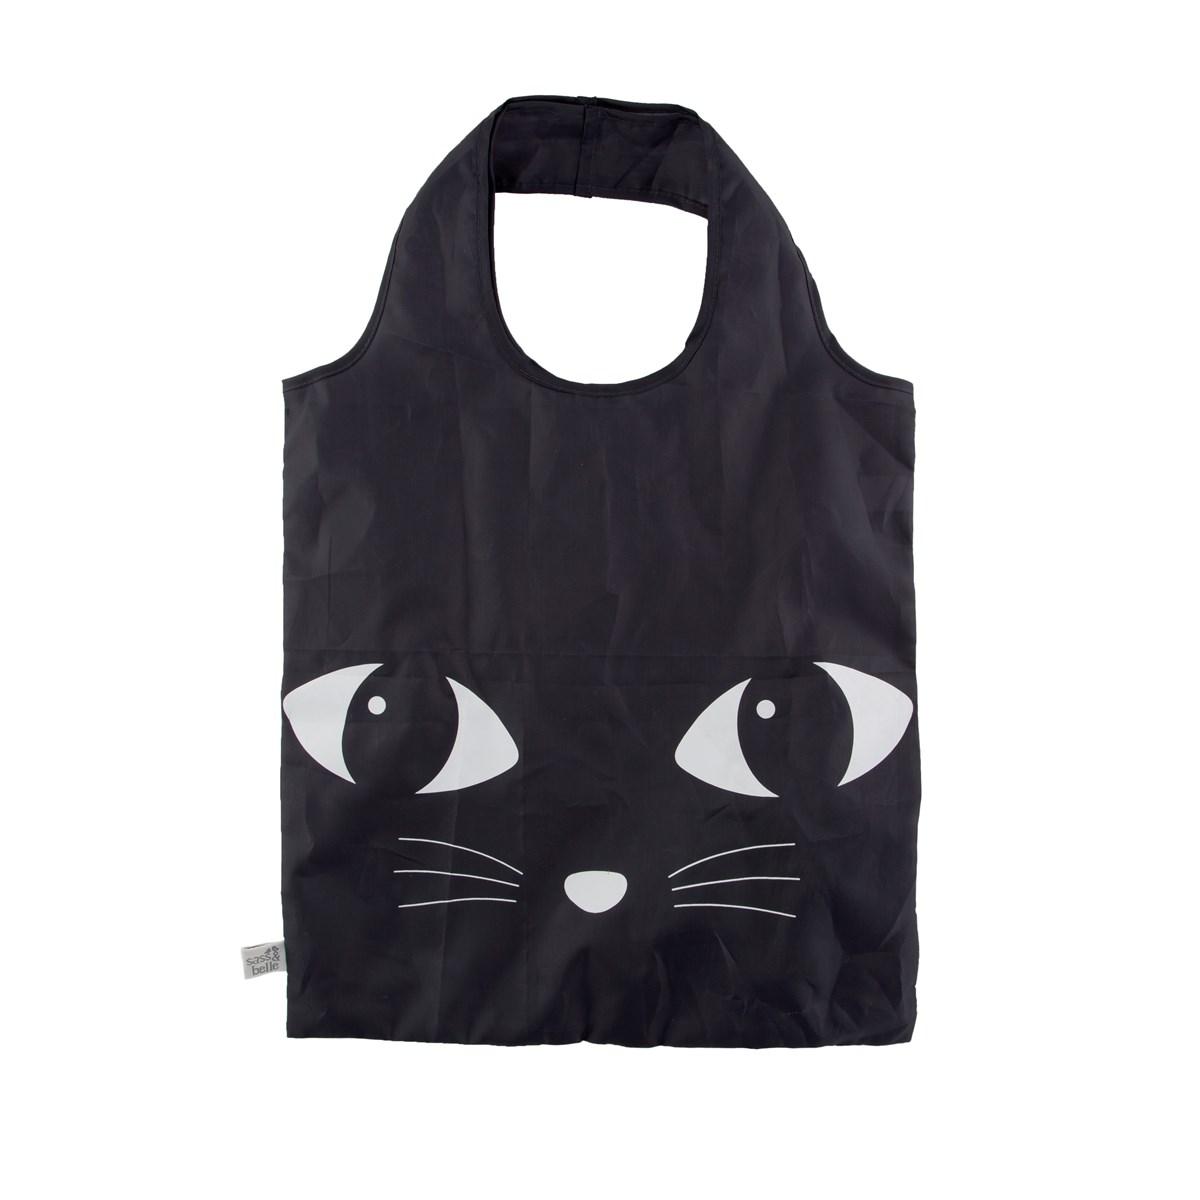 www.lulu-shop.fr sac tote bag chat noir